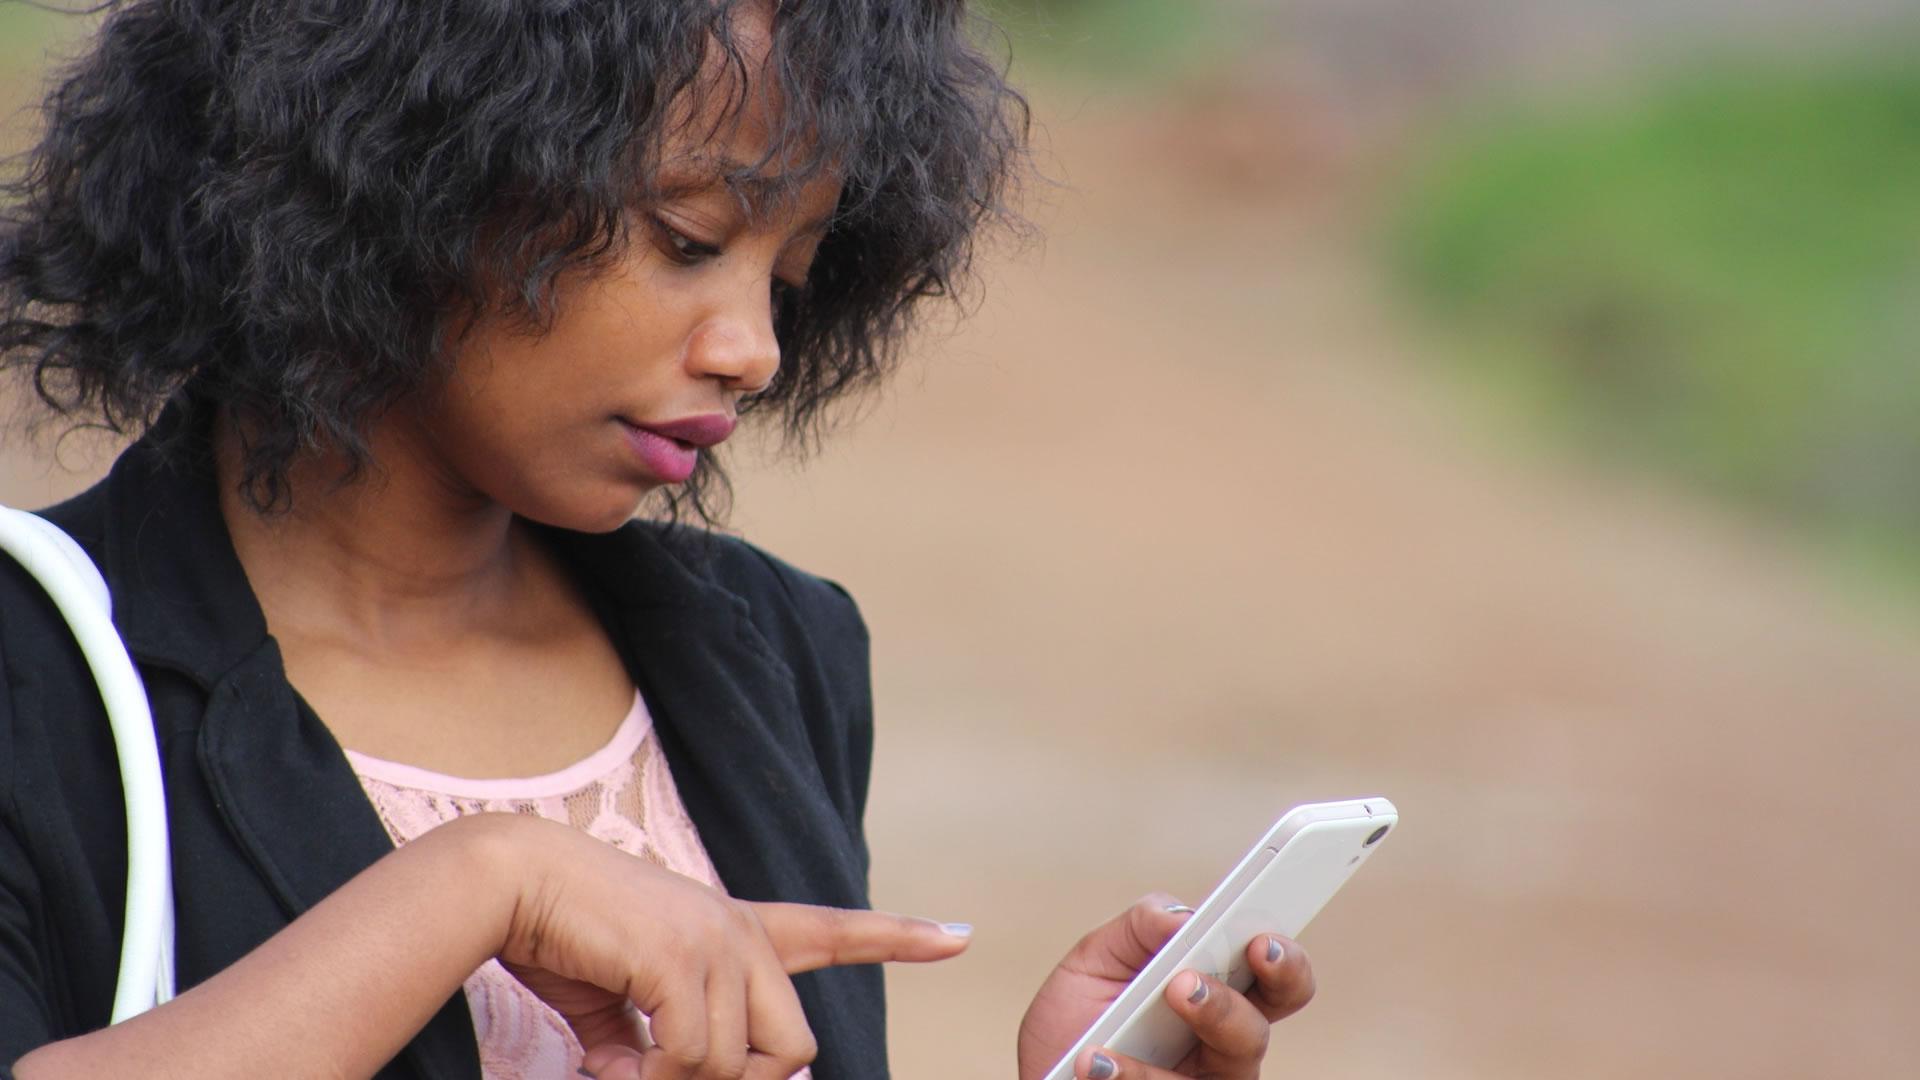 lady using phone